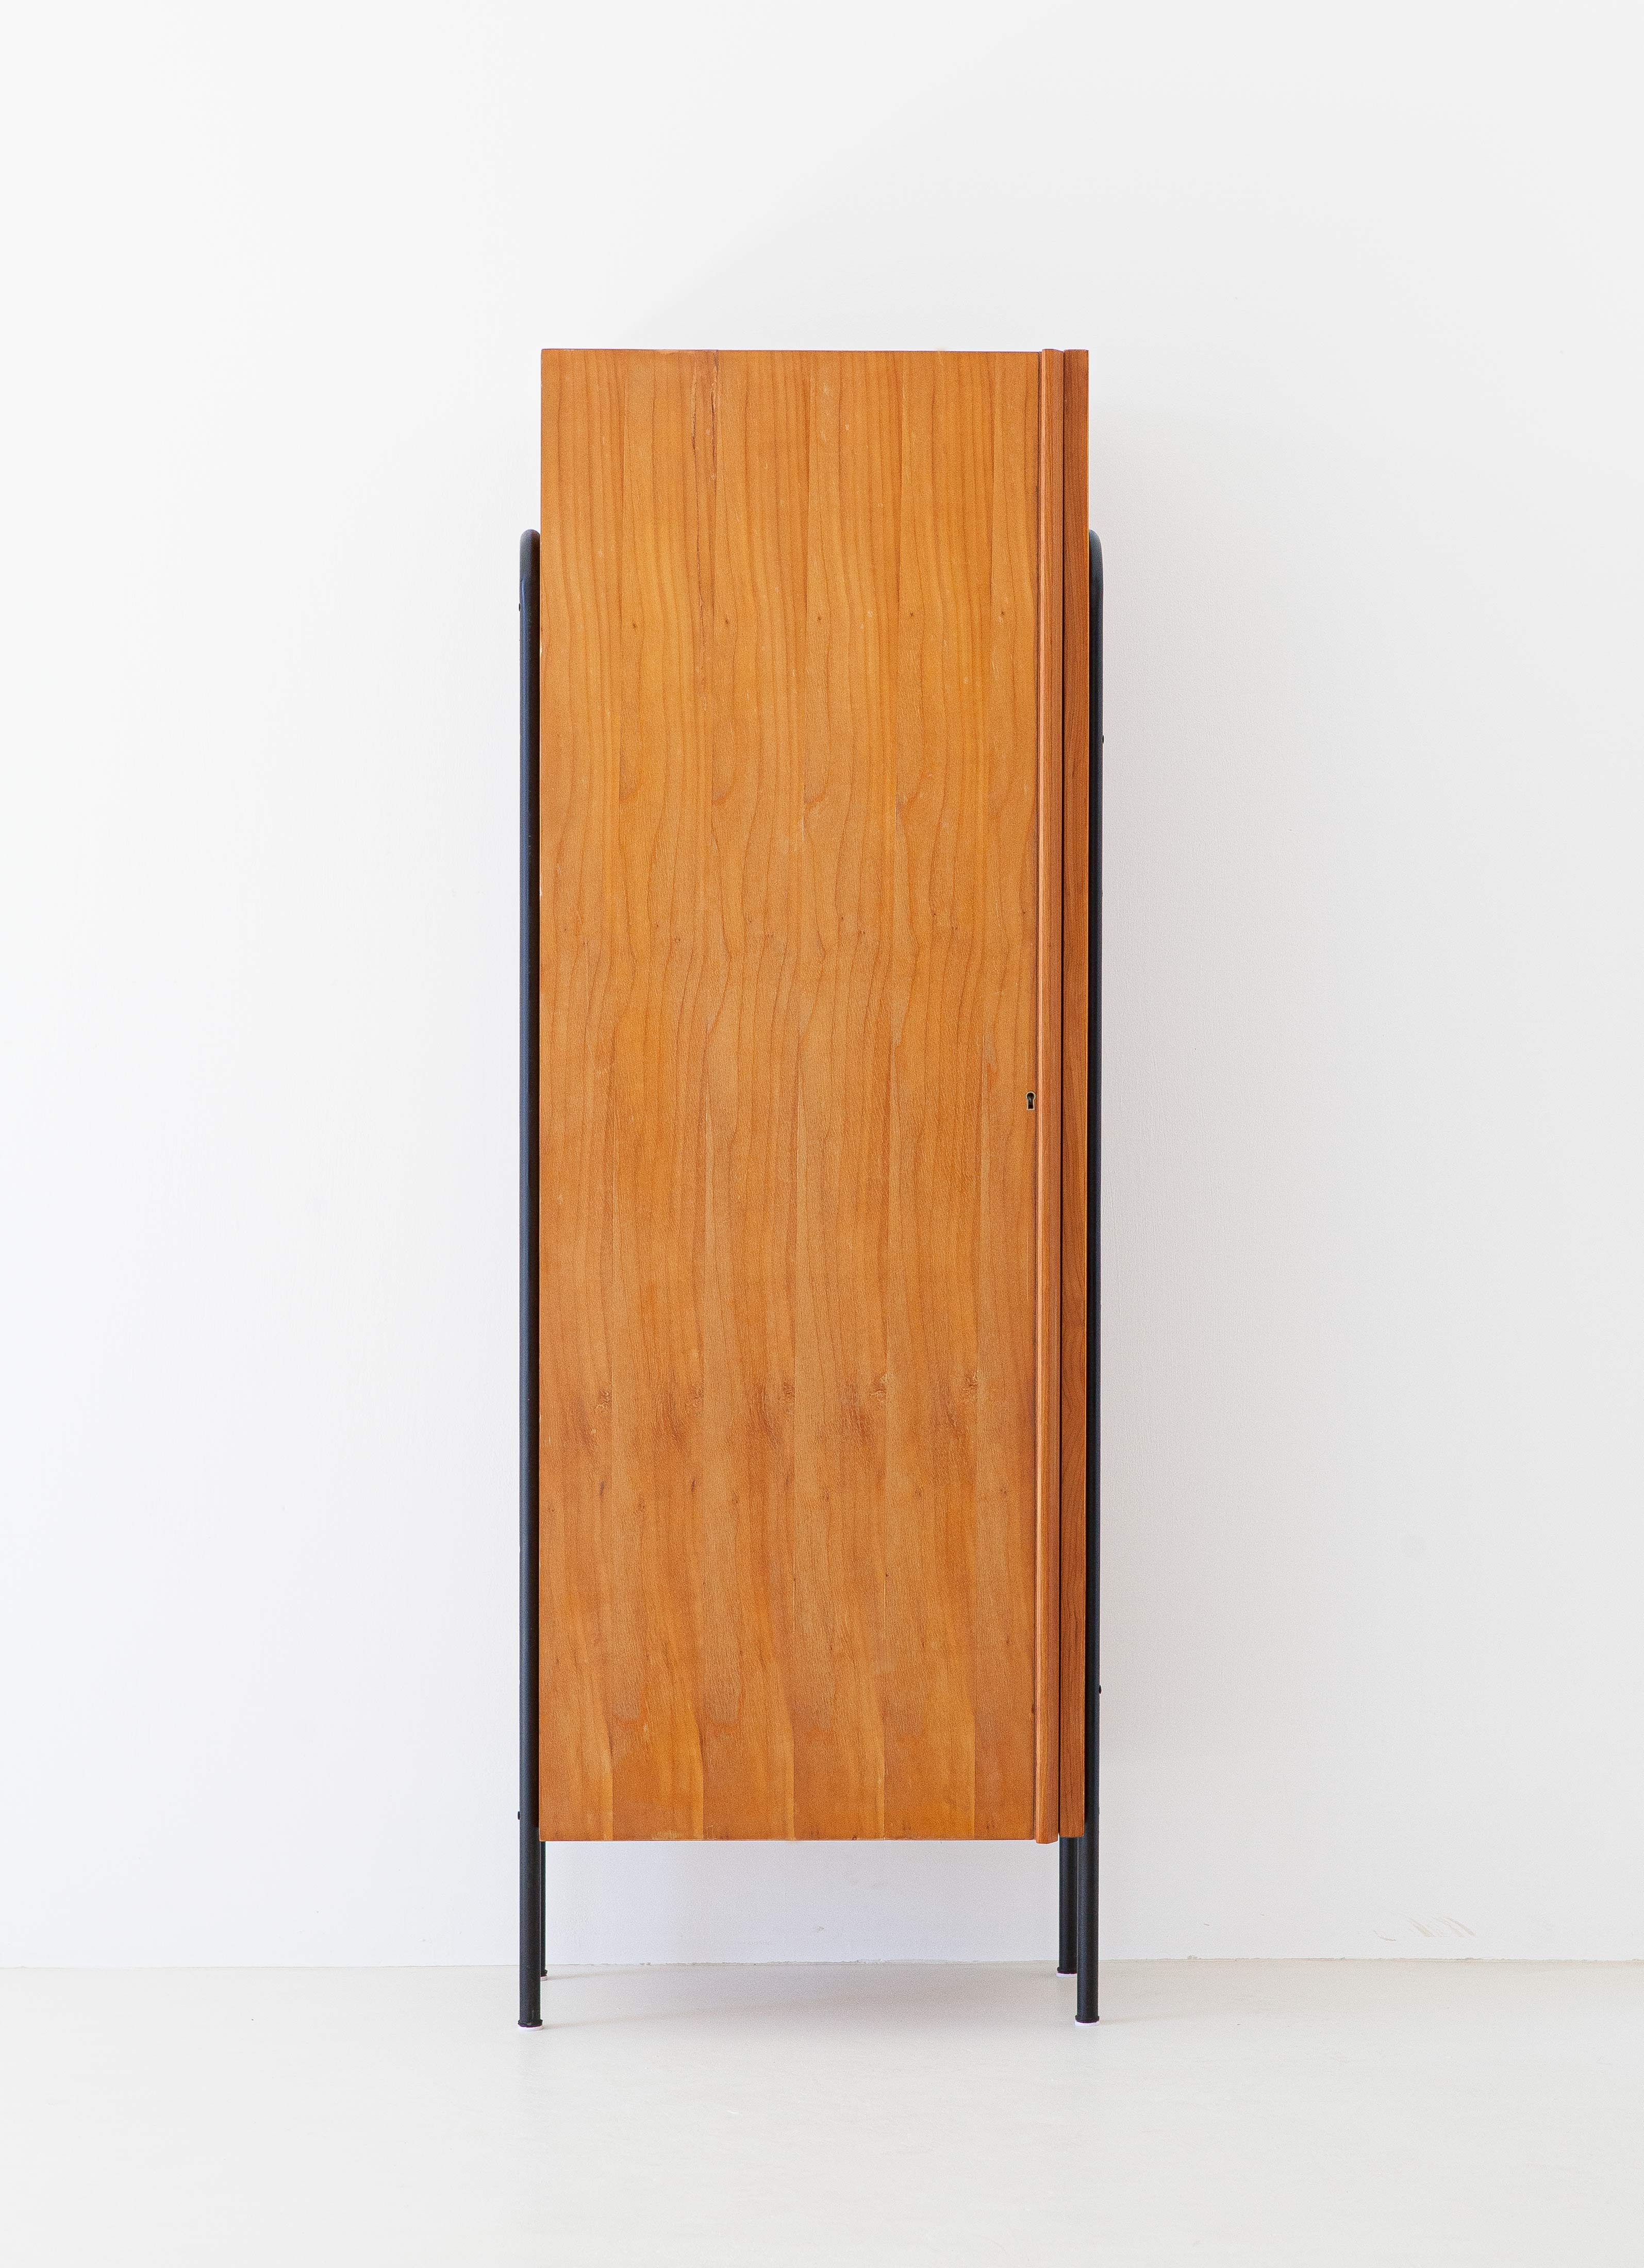 1950s-italian-light-wood-and-iron-wardrobe-cabinet-1-st114